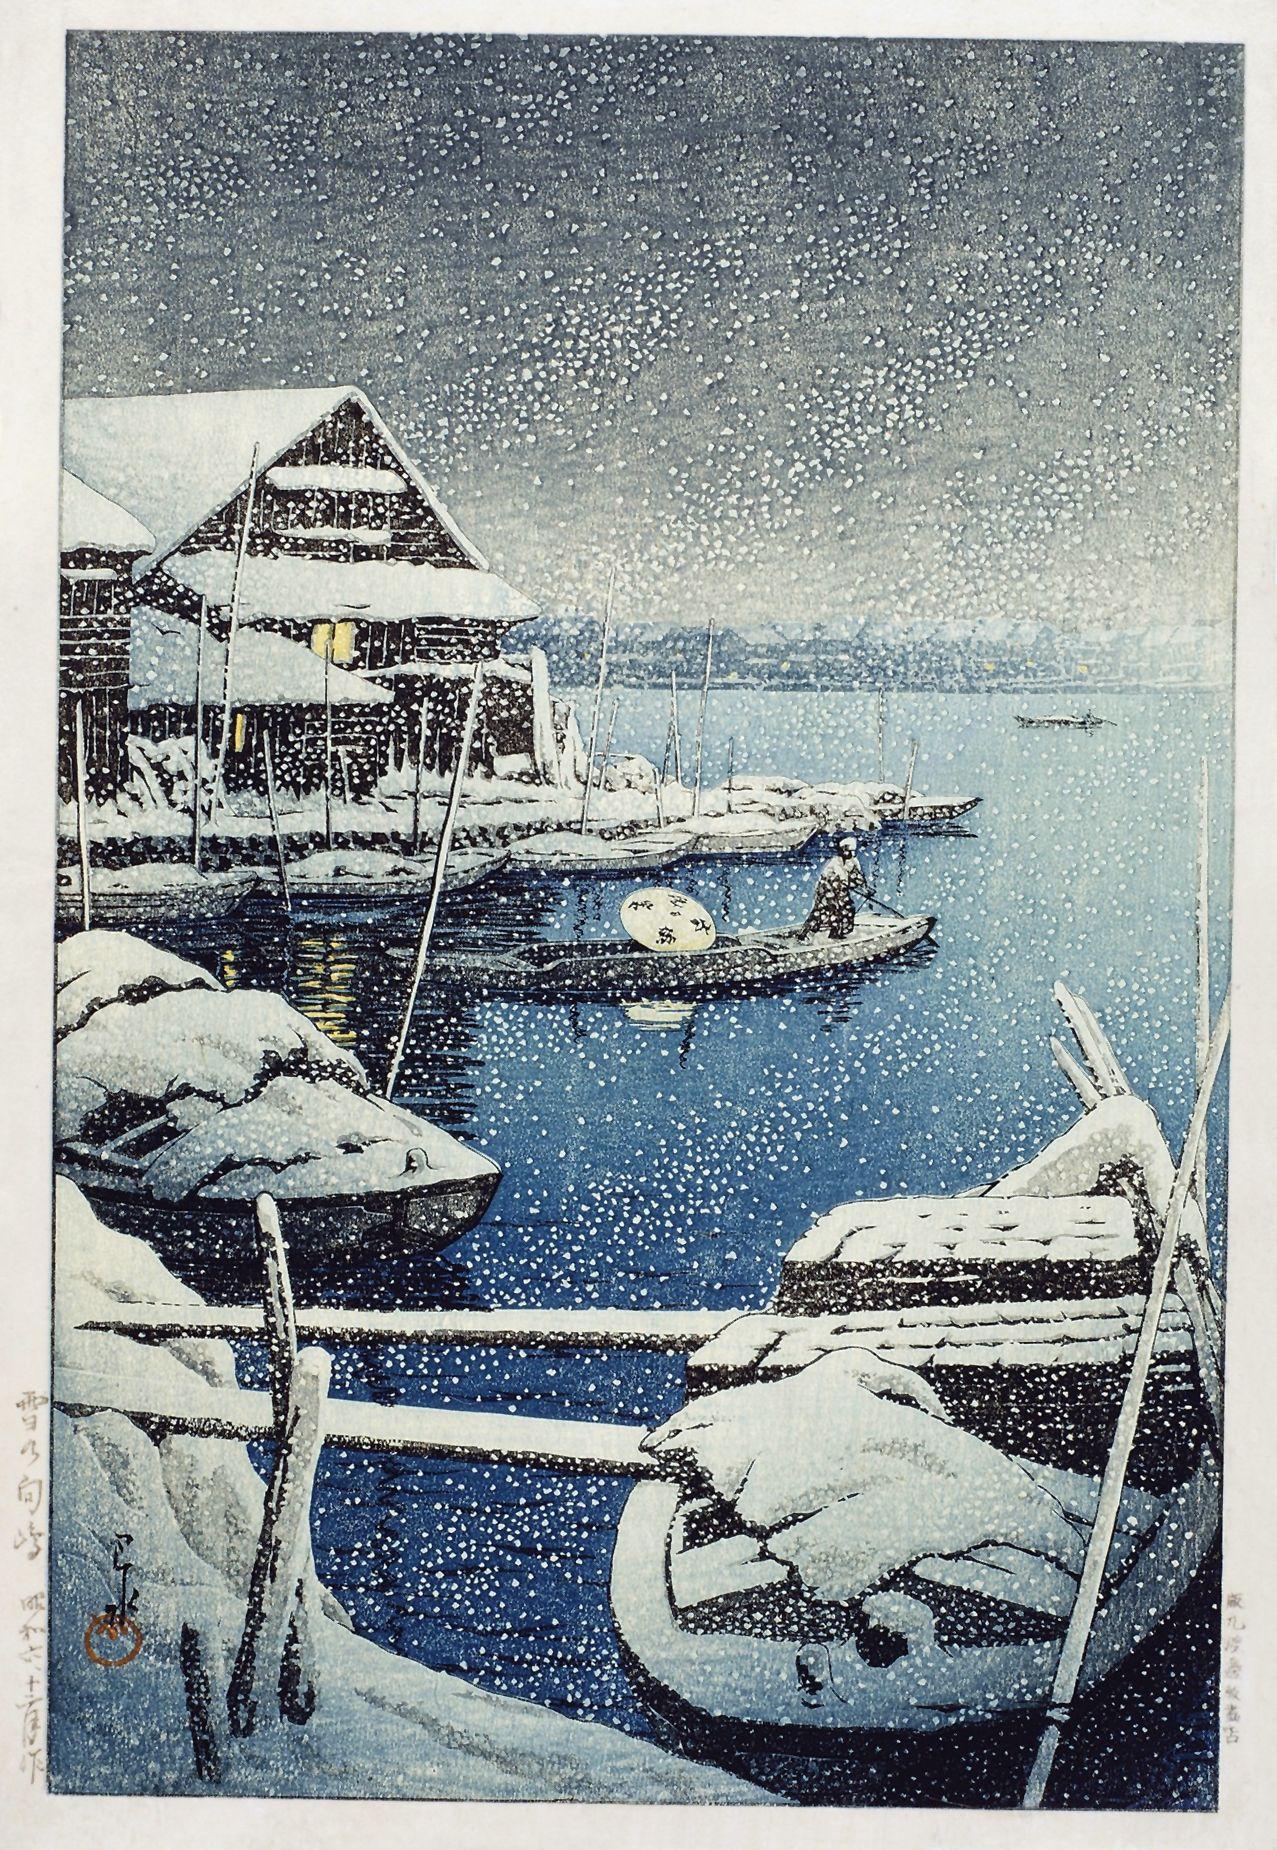 "Snow at Mukojima (""Yuki no Mukojima""), woodblock, carver/seal: 7-mm Heisei seal, 9.25 x 14.25 in., Dec. 1931 by Hasui KAWASE (1883-1957). Watanabe, Pub. Western critics claim this as an impressionistic image via Japanese Shin-hanga (trans., literally, ""new prints"") style (Wikipedia: ""new woodcut block prints"" was an art movement in early 20th-century Japan, during the Taishō and Shōwa periods, that revitalized traditional ukiyo-e art rooted in the Edo and Meiji periods (17th–19th century)."